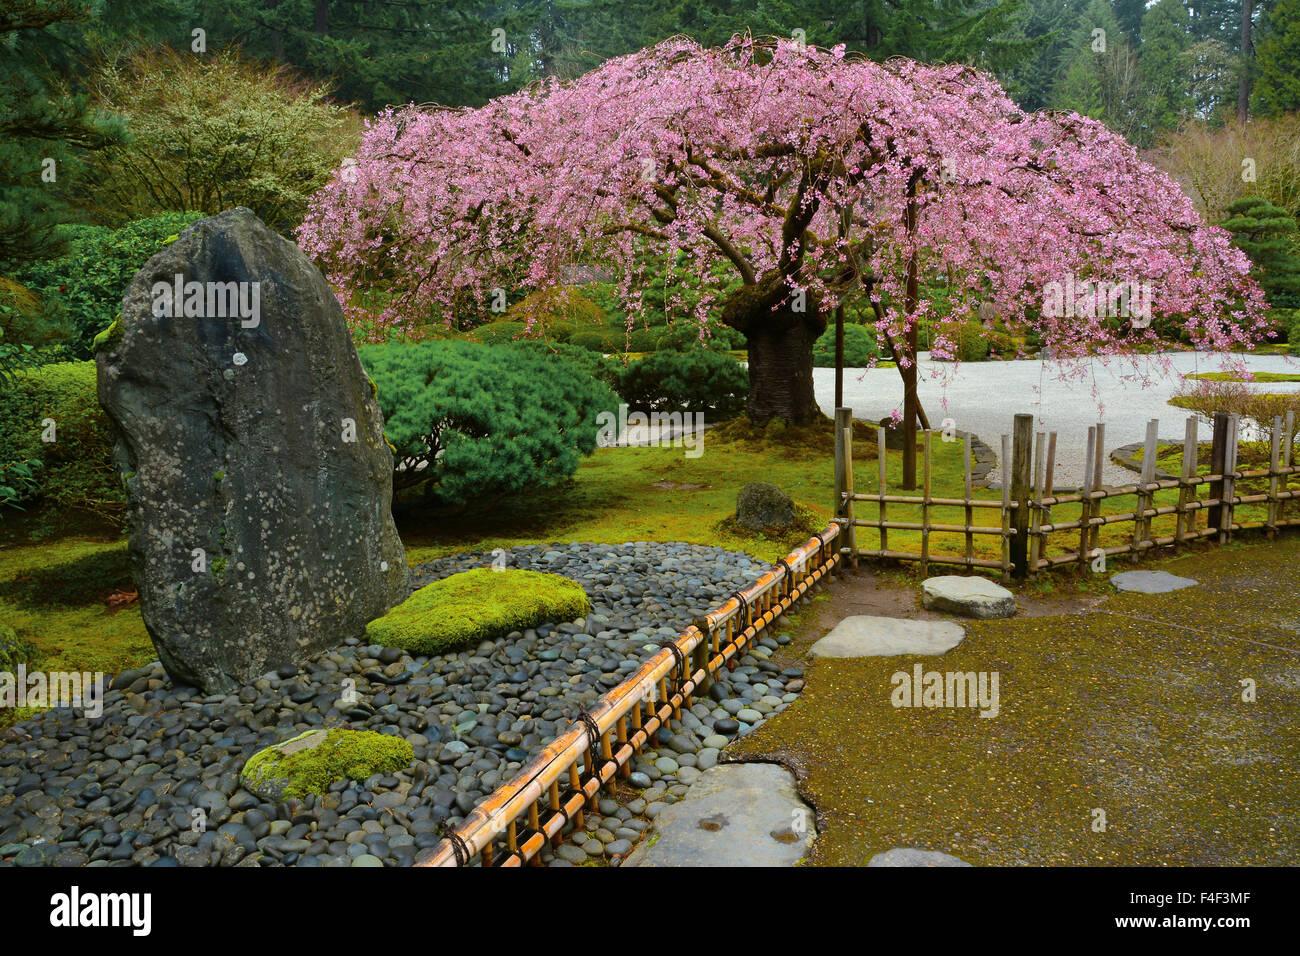 Weeping cherry flat lat garden portland japanese garden portland stock photo 88842671 alamy for Japanese garden portland oregon